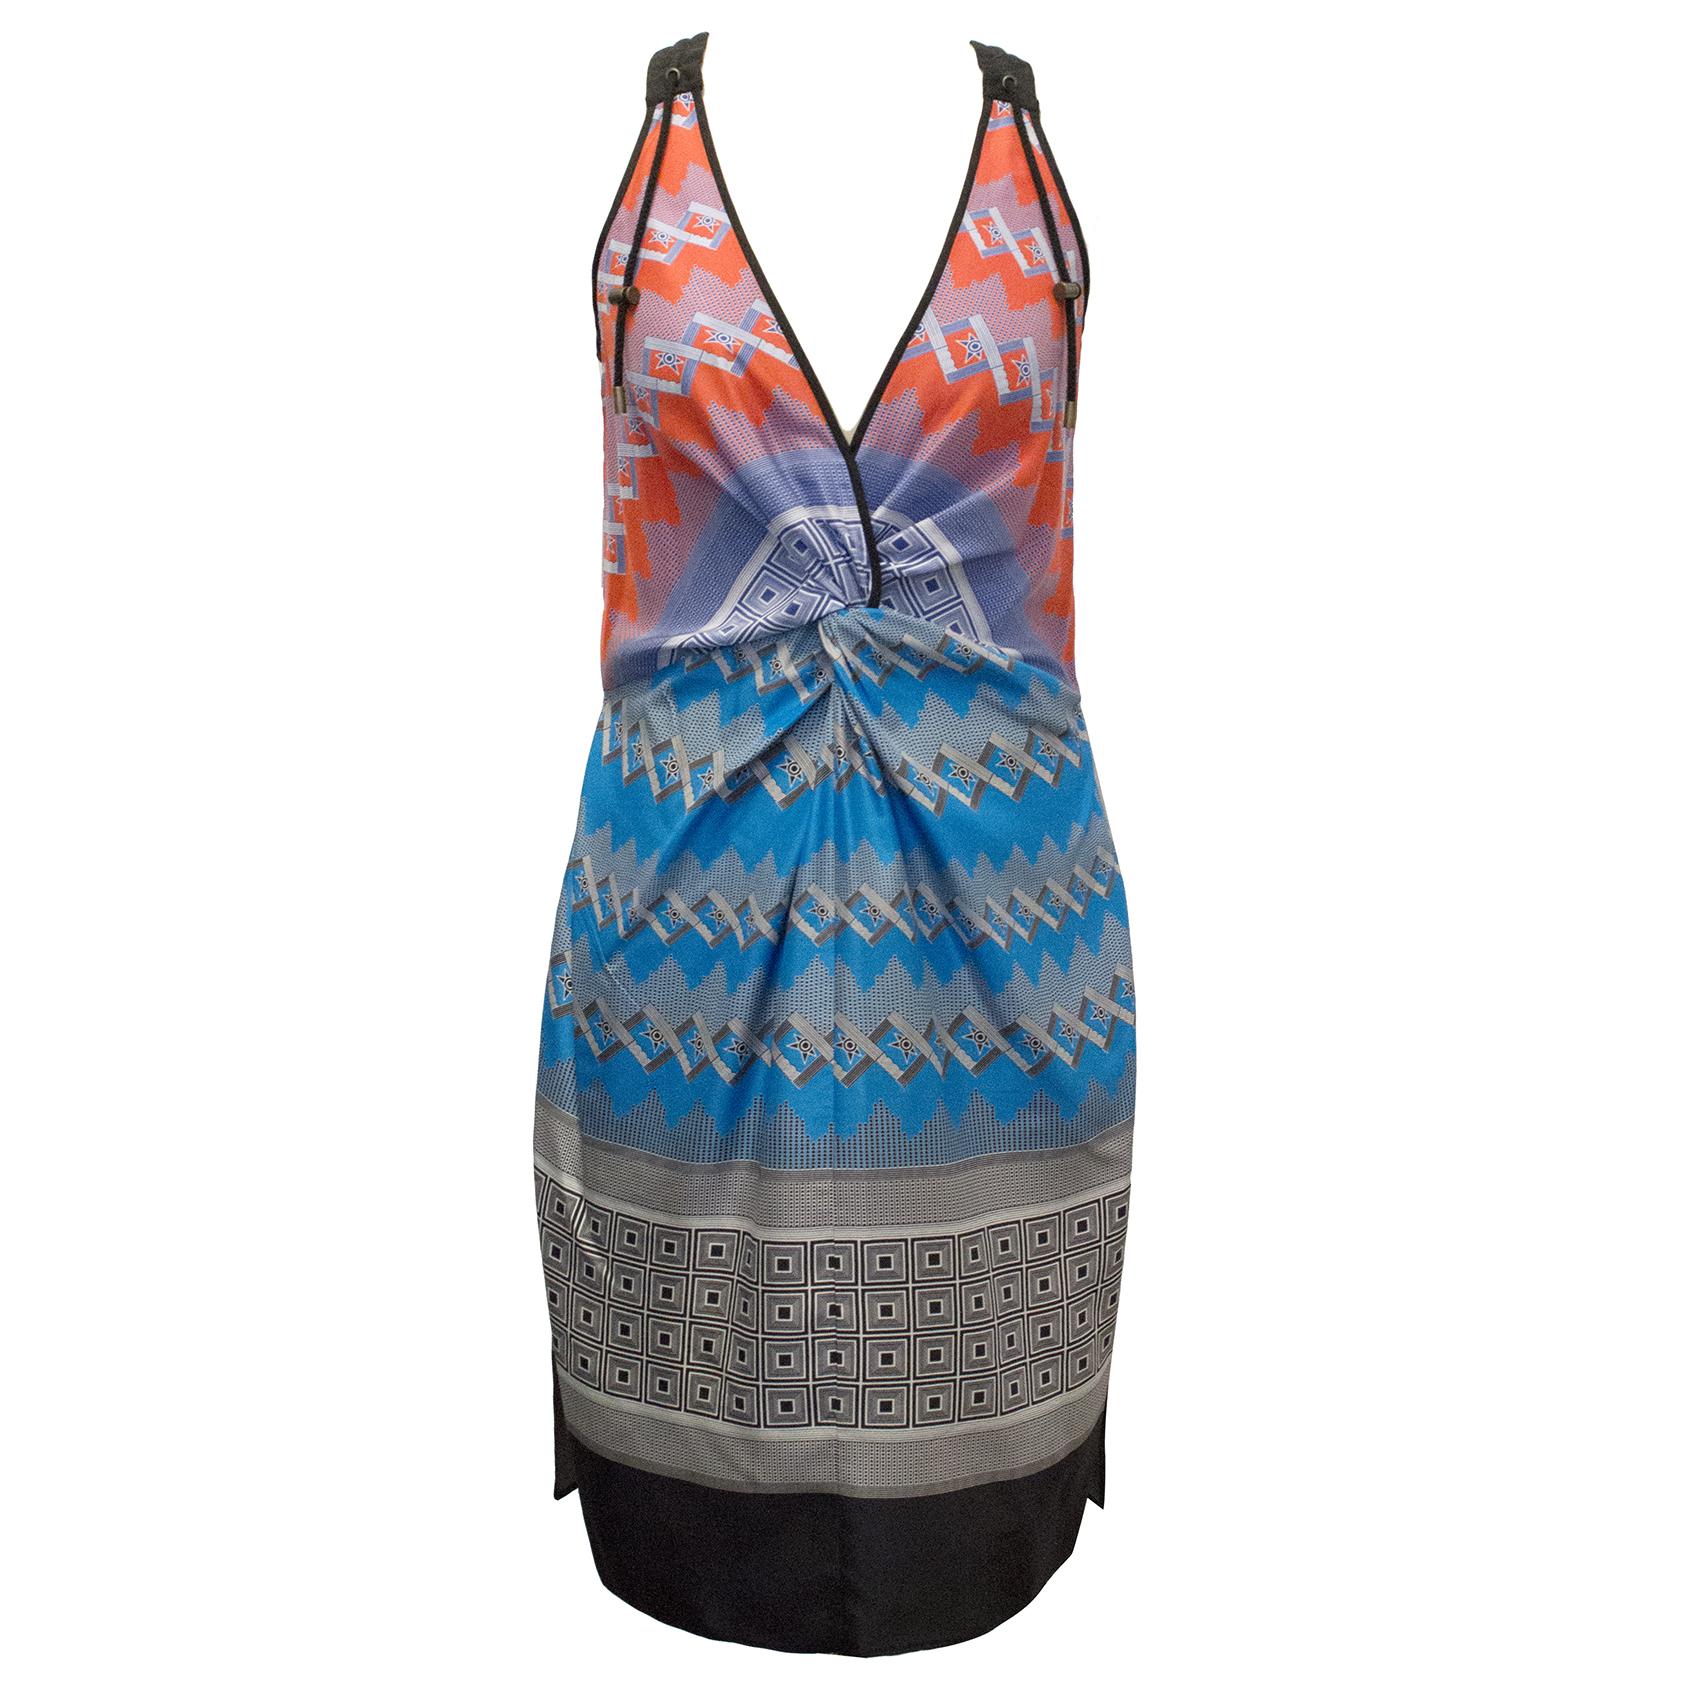 Derek Lam Orange and Blue Printed Silk Dress